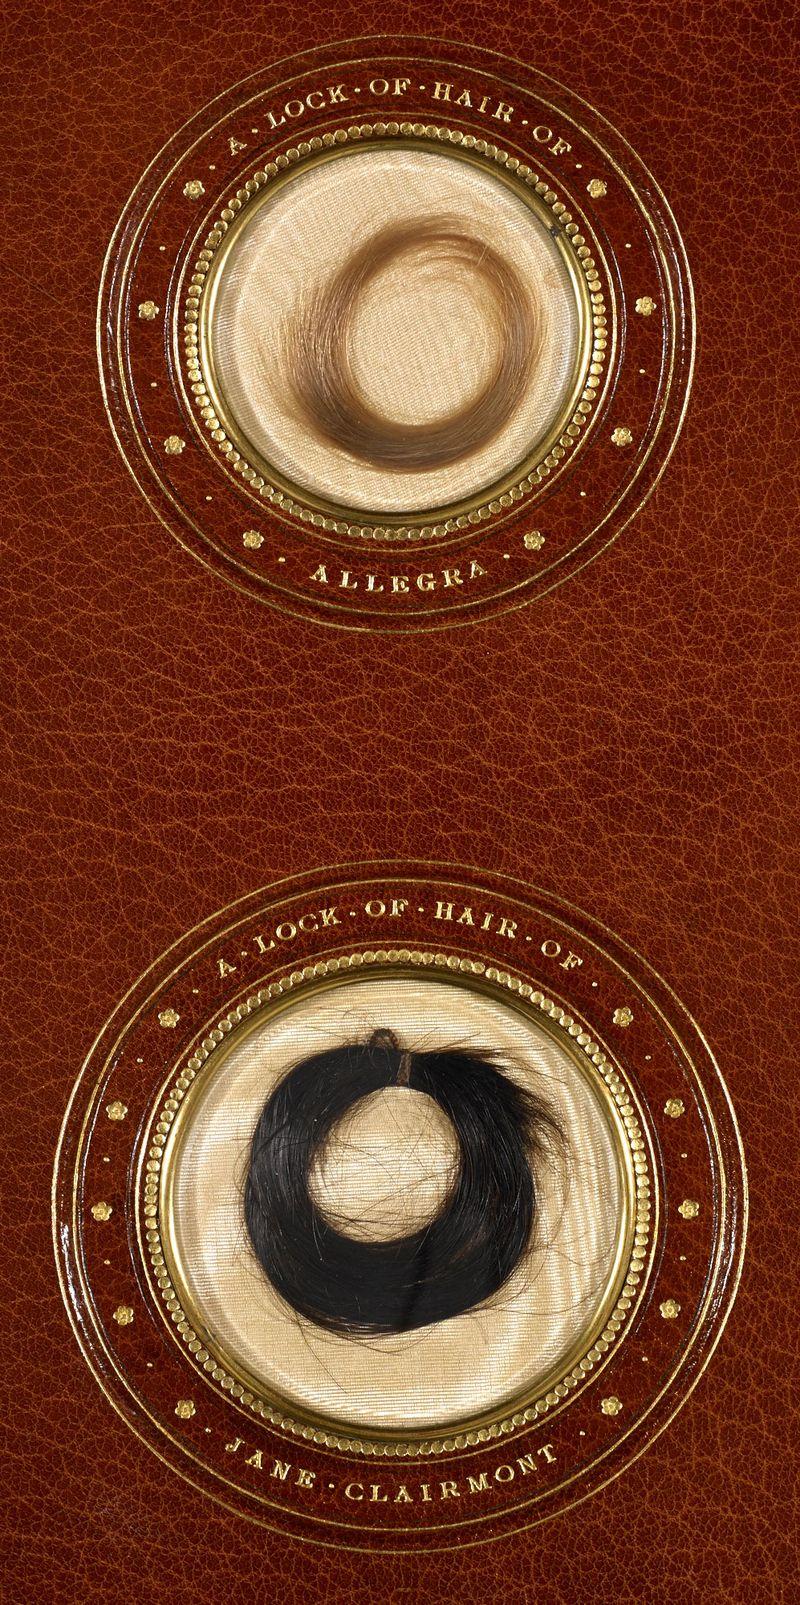 C clairmont and allegras hair